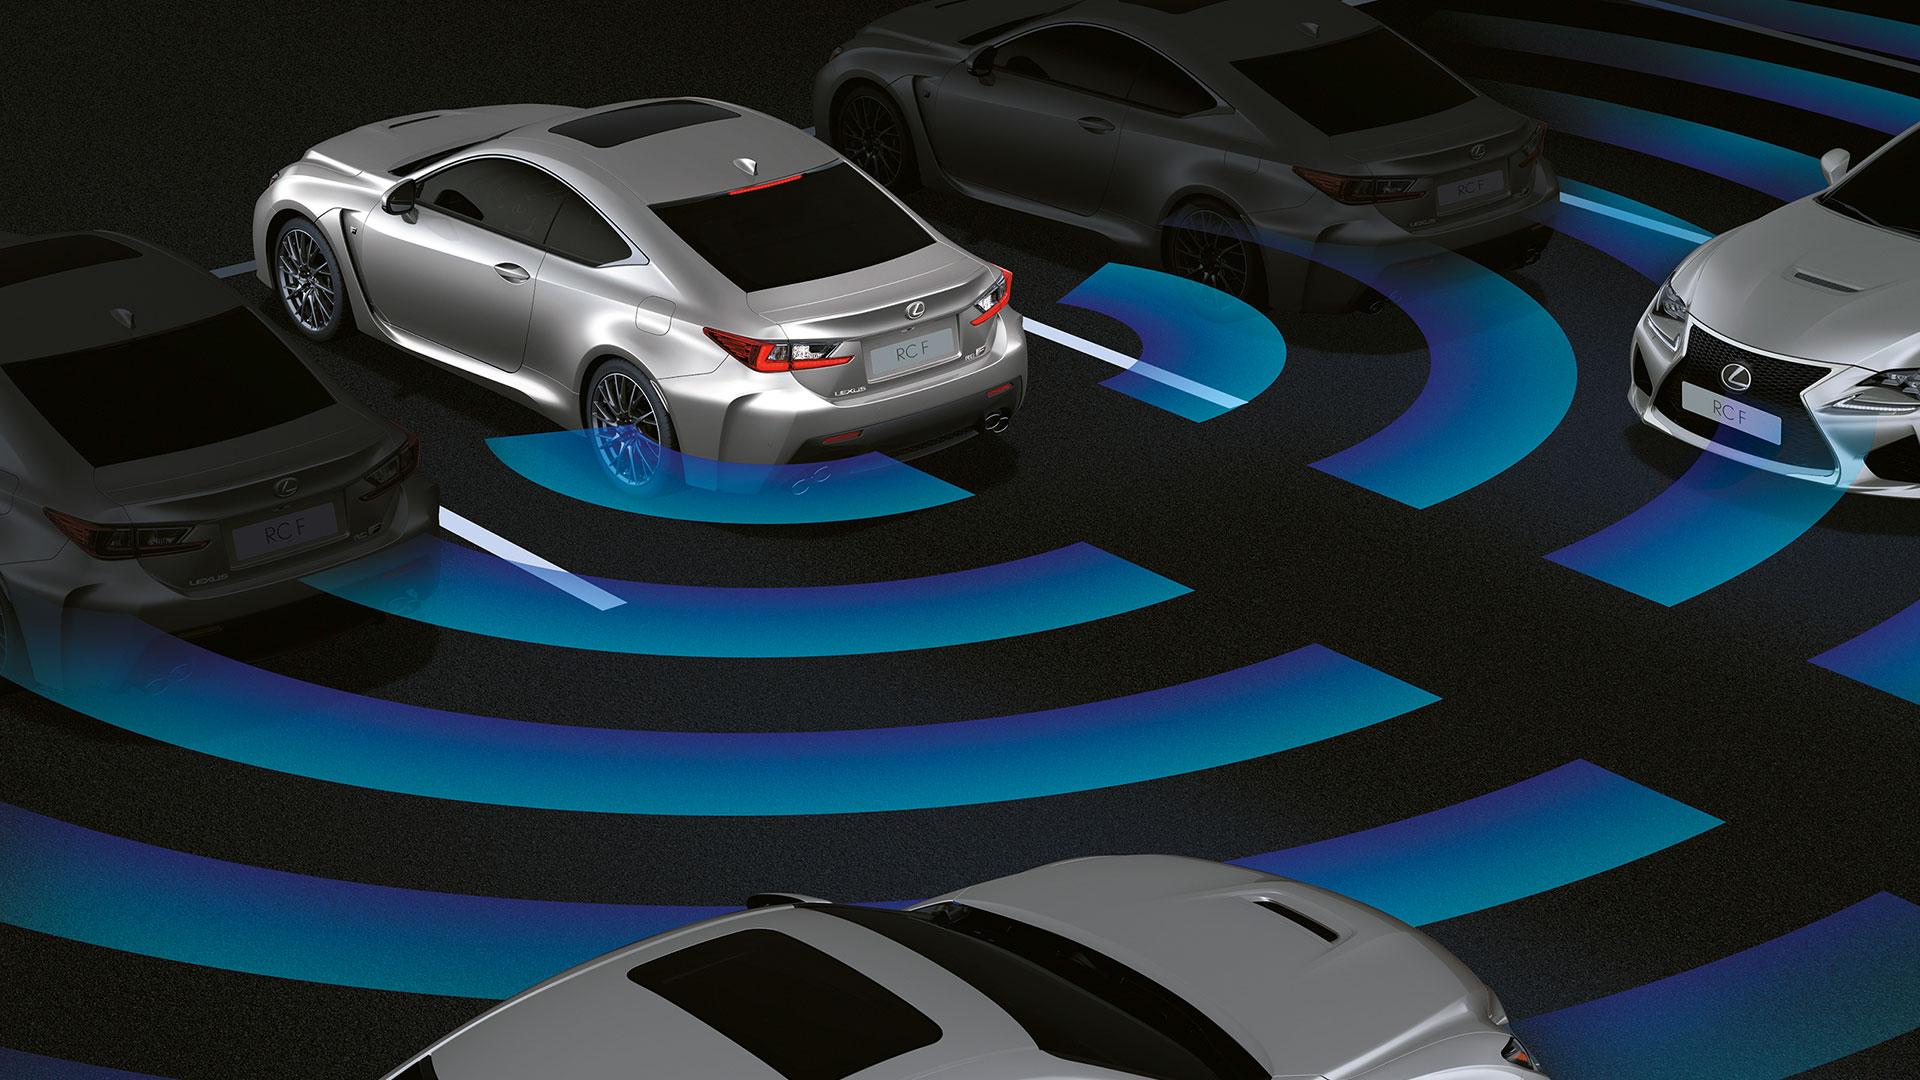 2018 lexus rc f features rear cross traffic alert